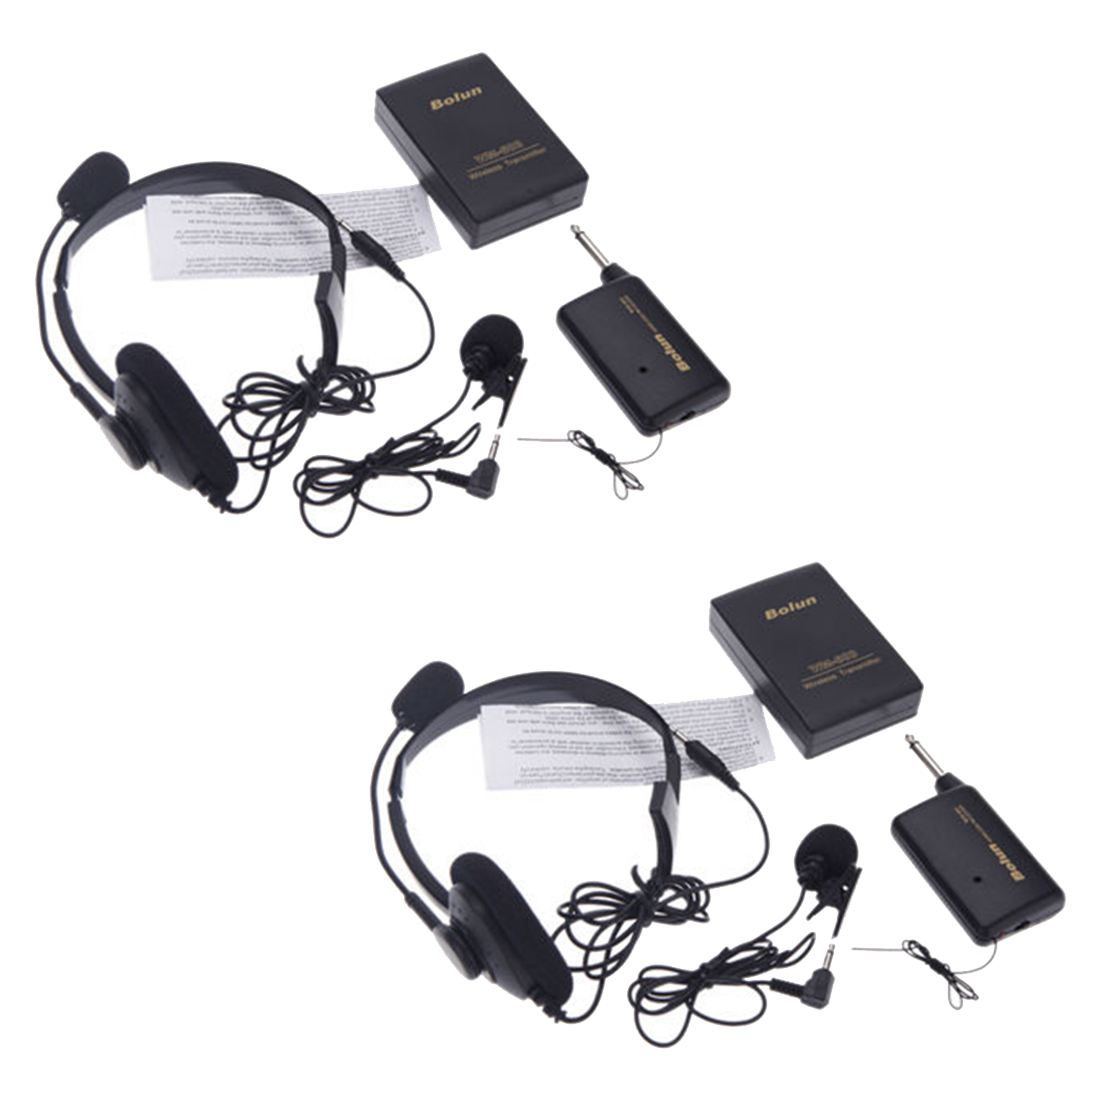 2x Revers Draadloze Microfoon Afstandsbediening Microfoon Systeem Kit Fm Zender Ontvanger